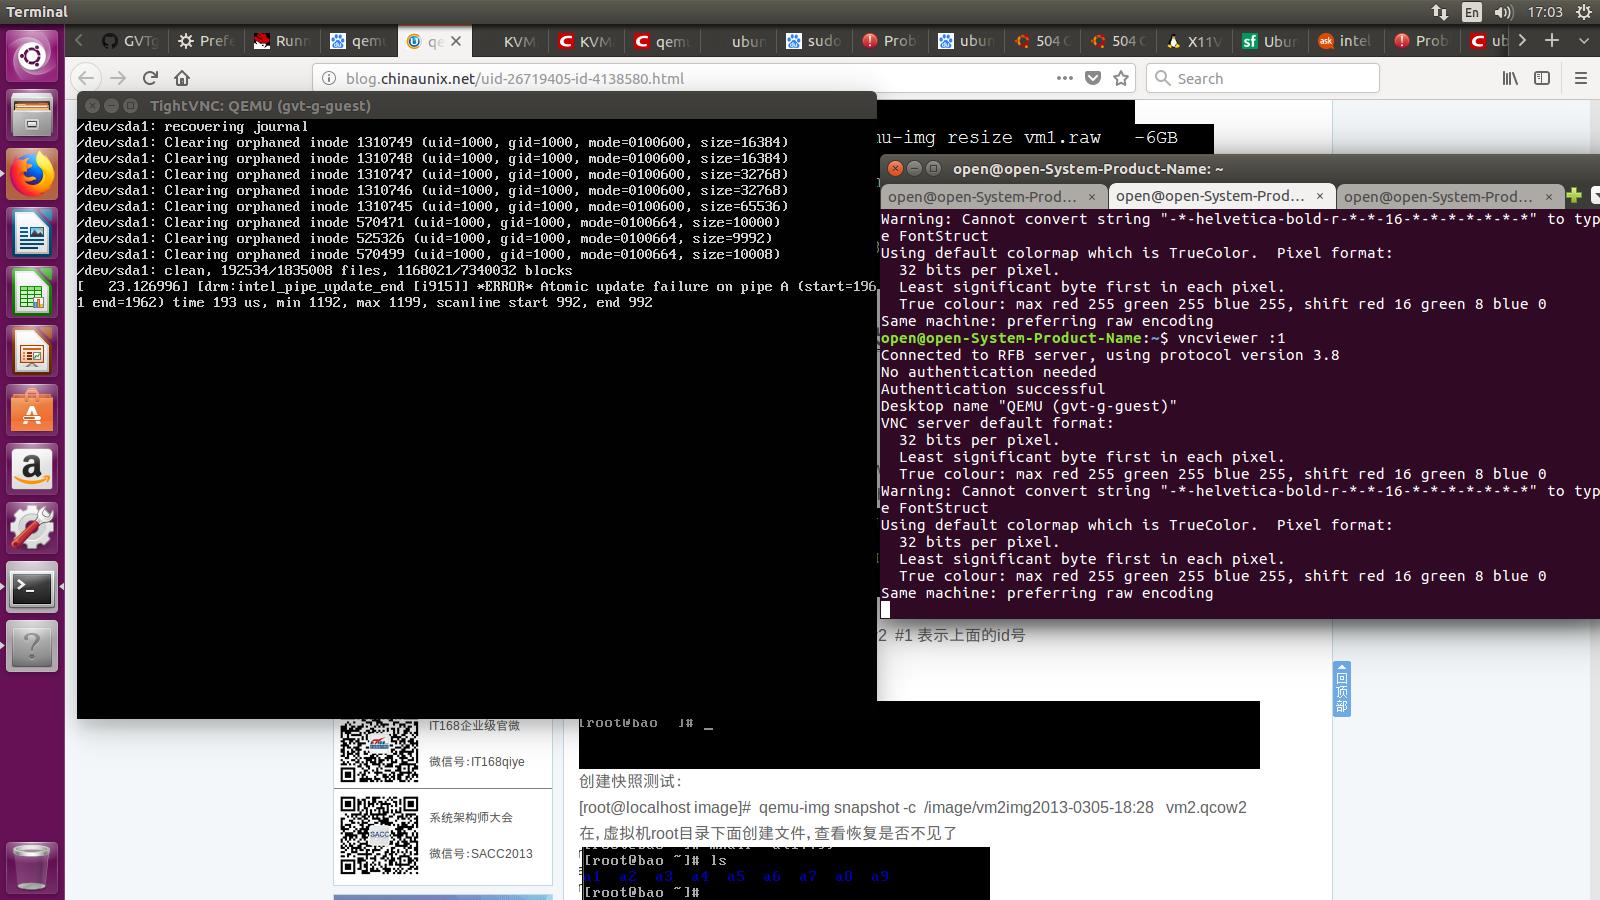 Dartflipcards : Linux print dev_dbg